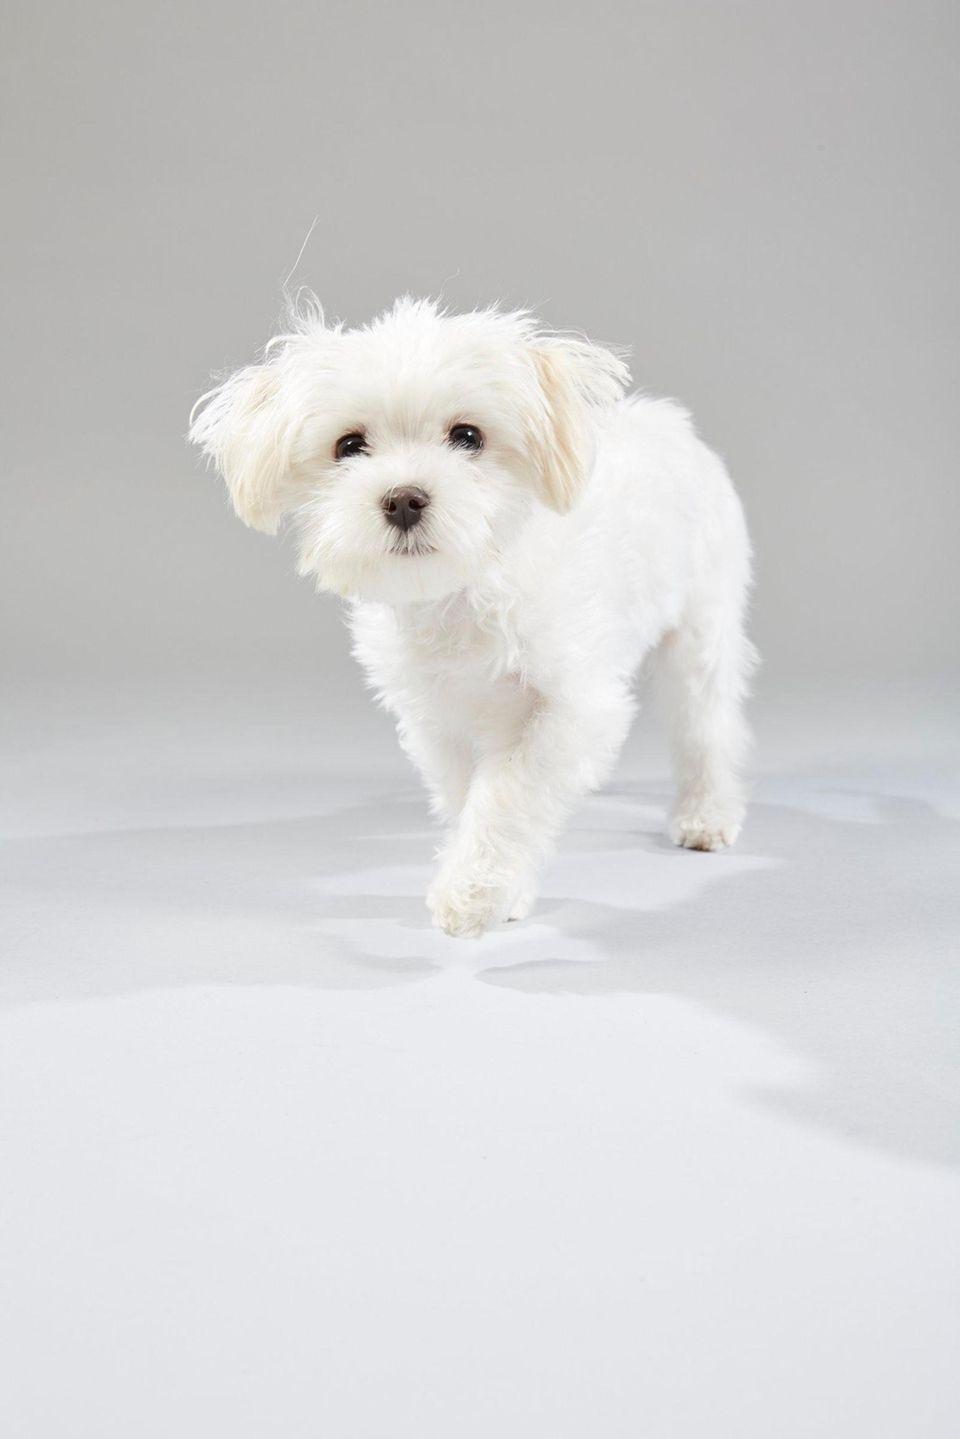 Puppy portrait for Puppy Bowl XV